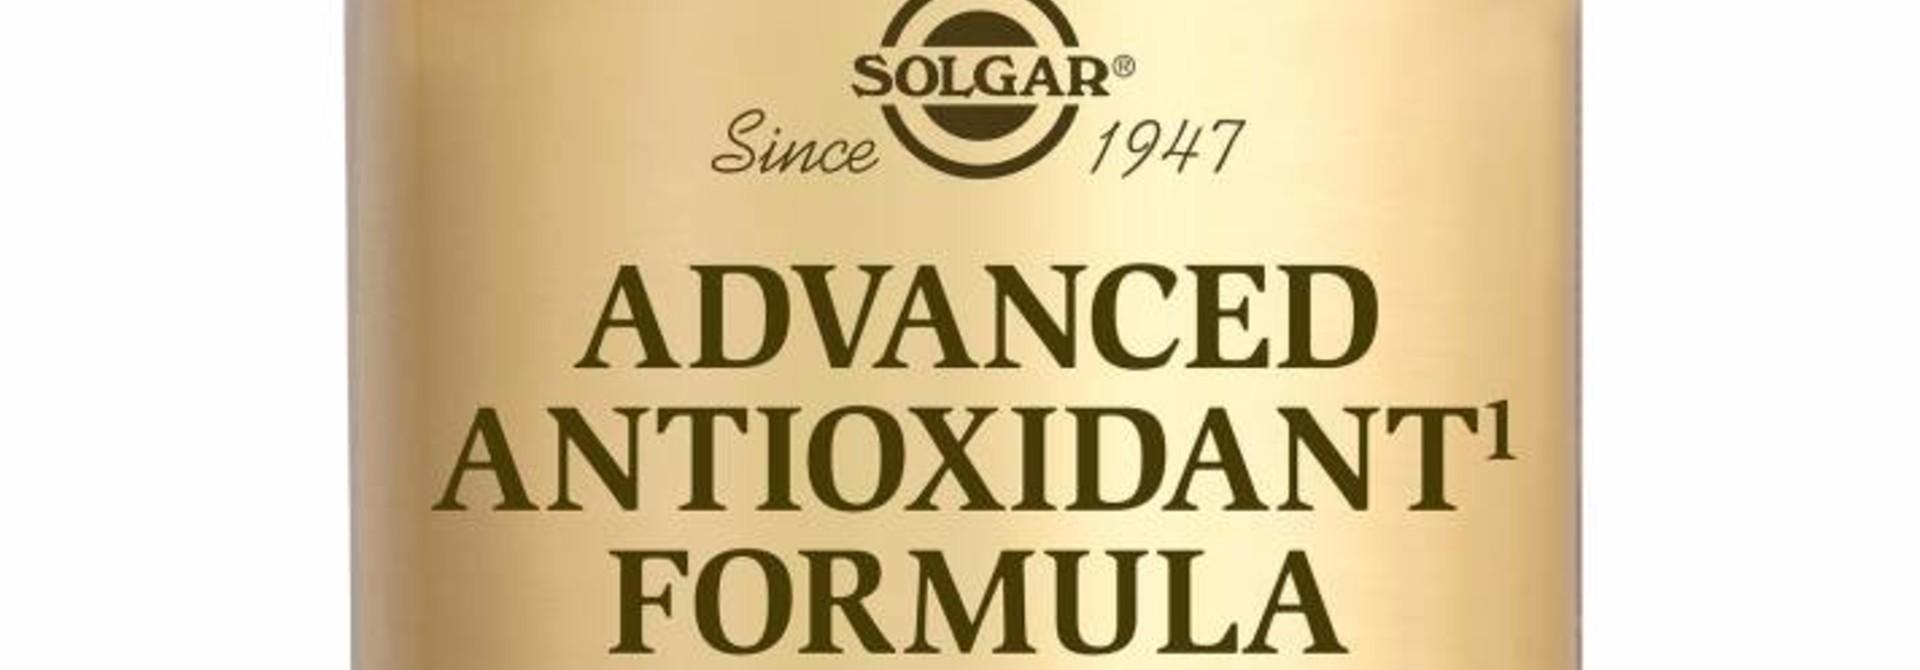 Advanced Antioxidant Formula 120 plantaardige capsules